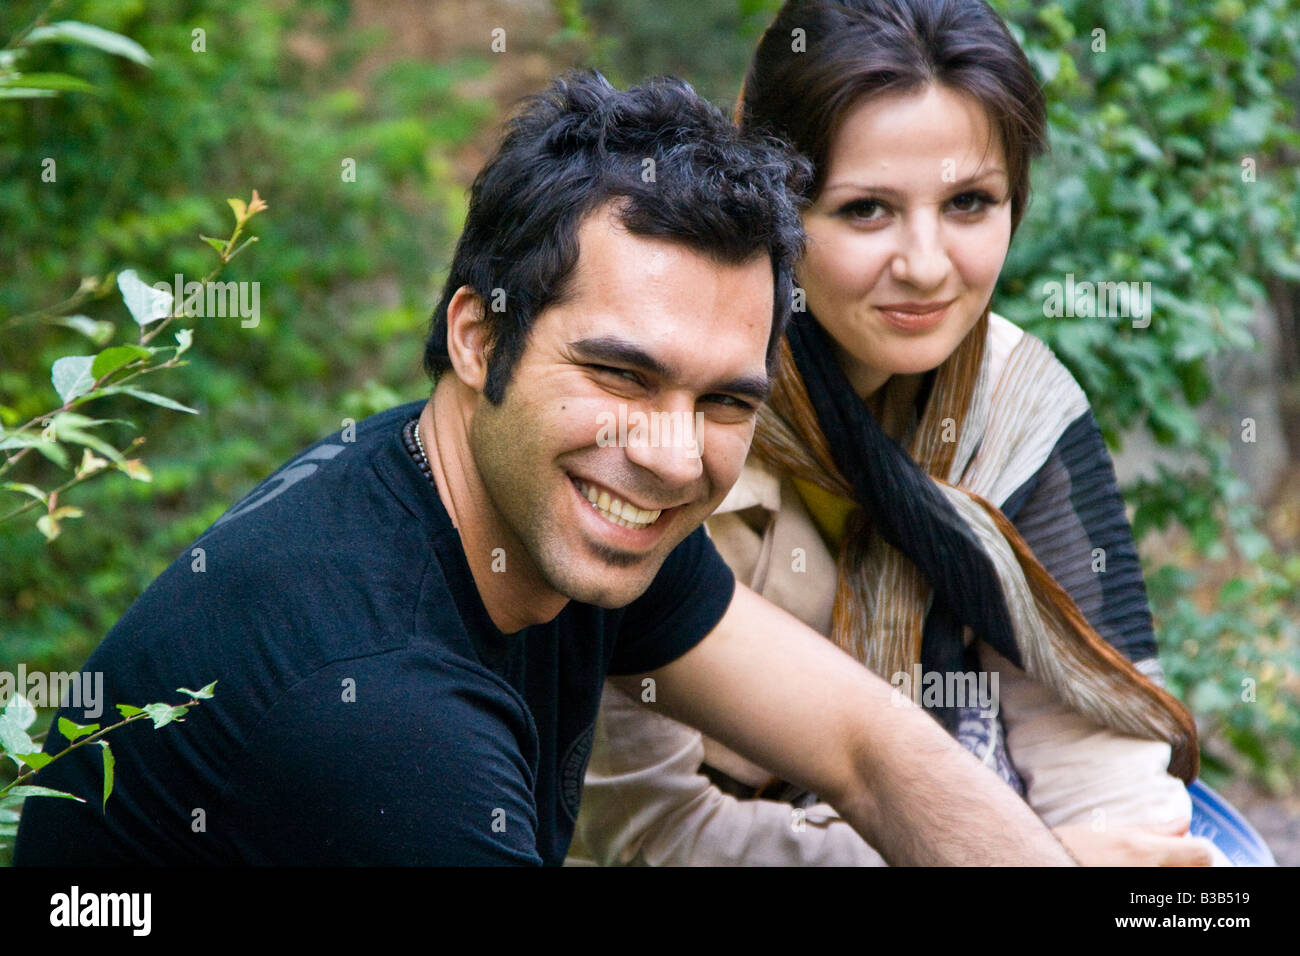 iranian dating tehran